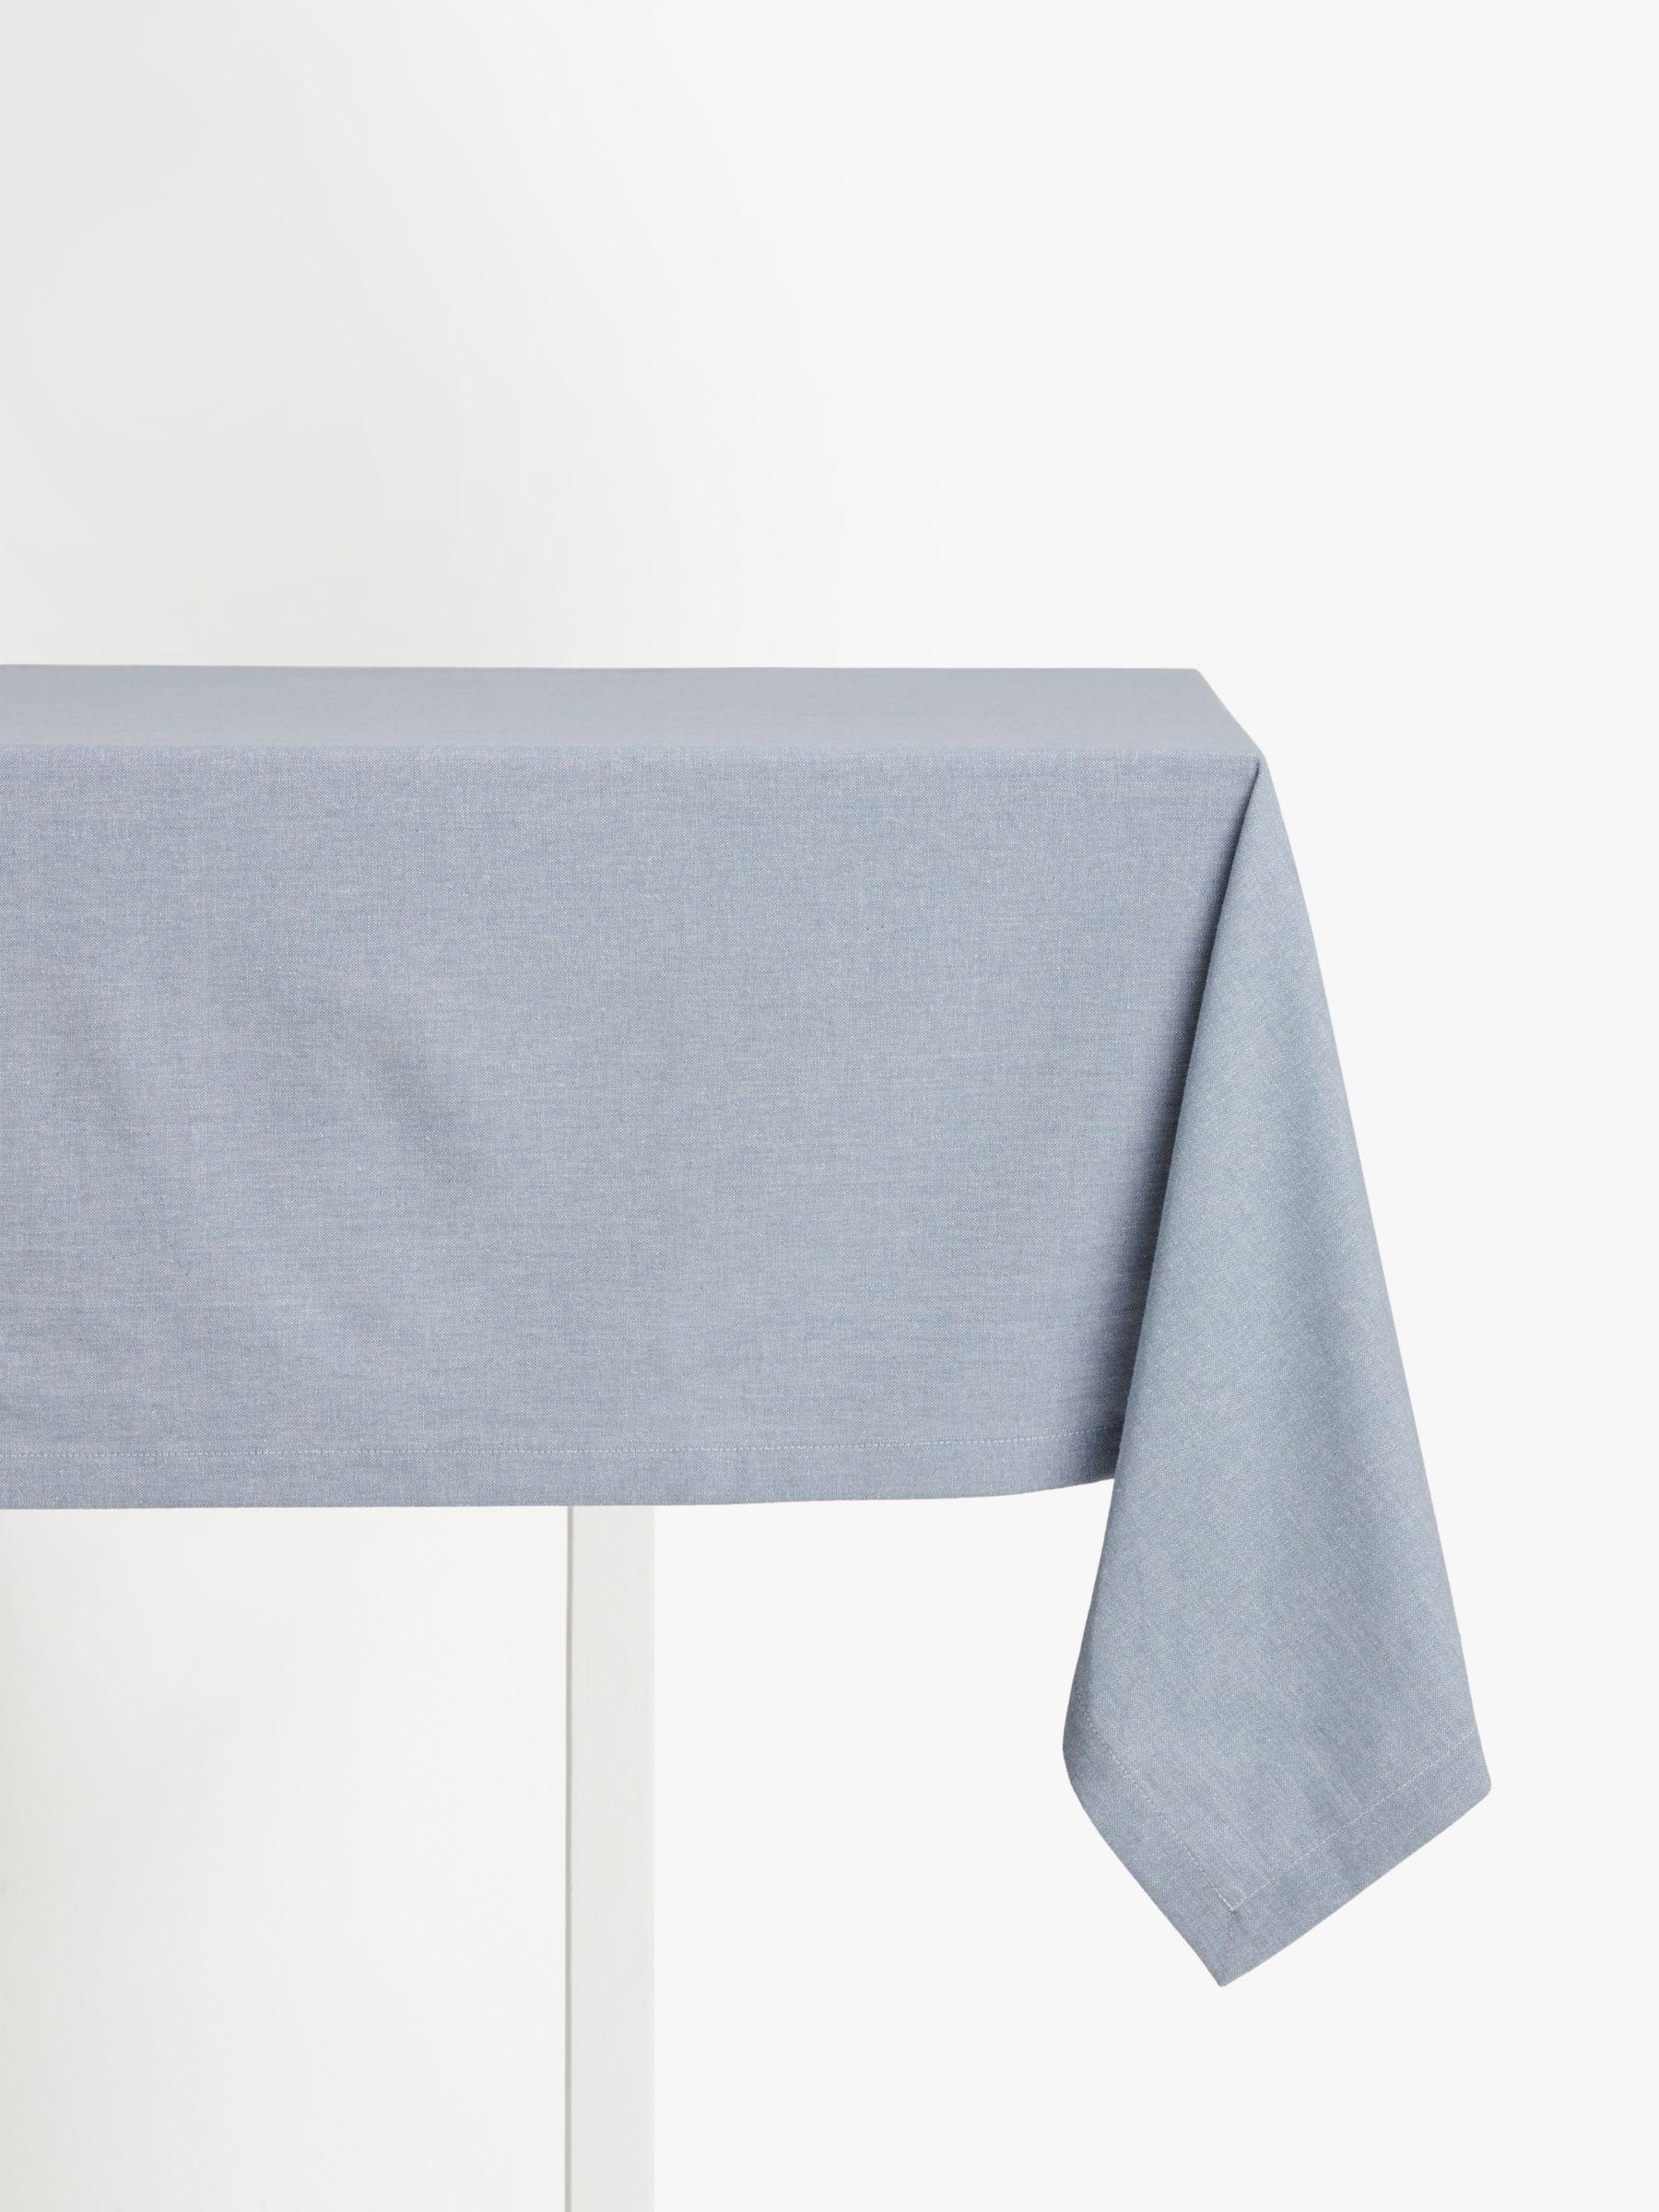 John Lewis & Partners Chambray Weave Cotton Tablecloth, Powder Blue